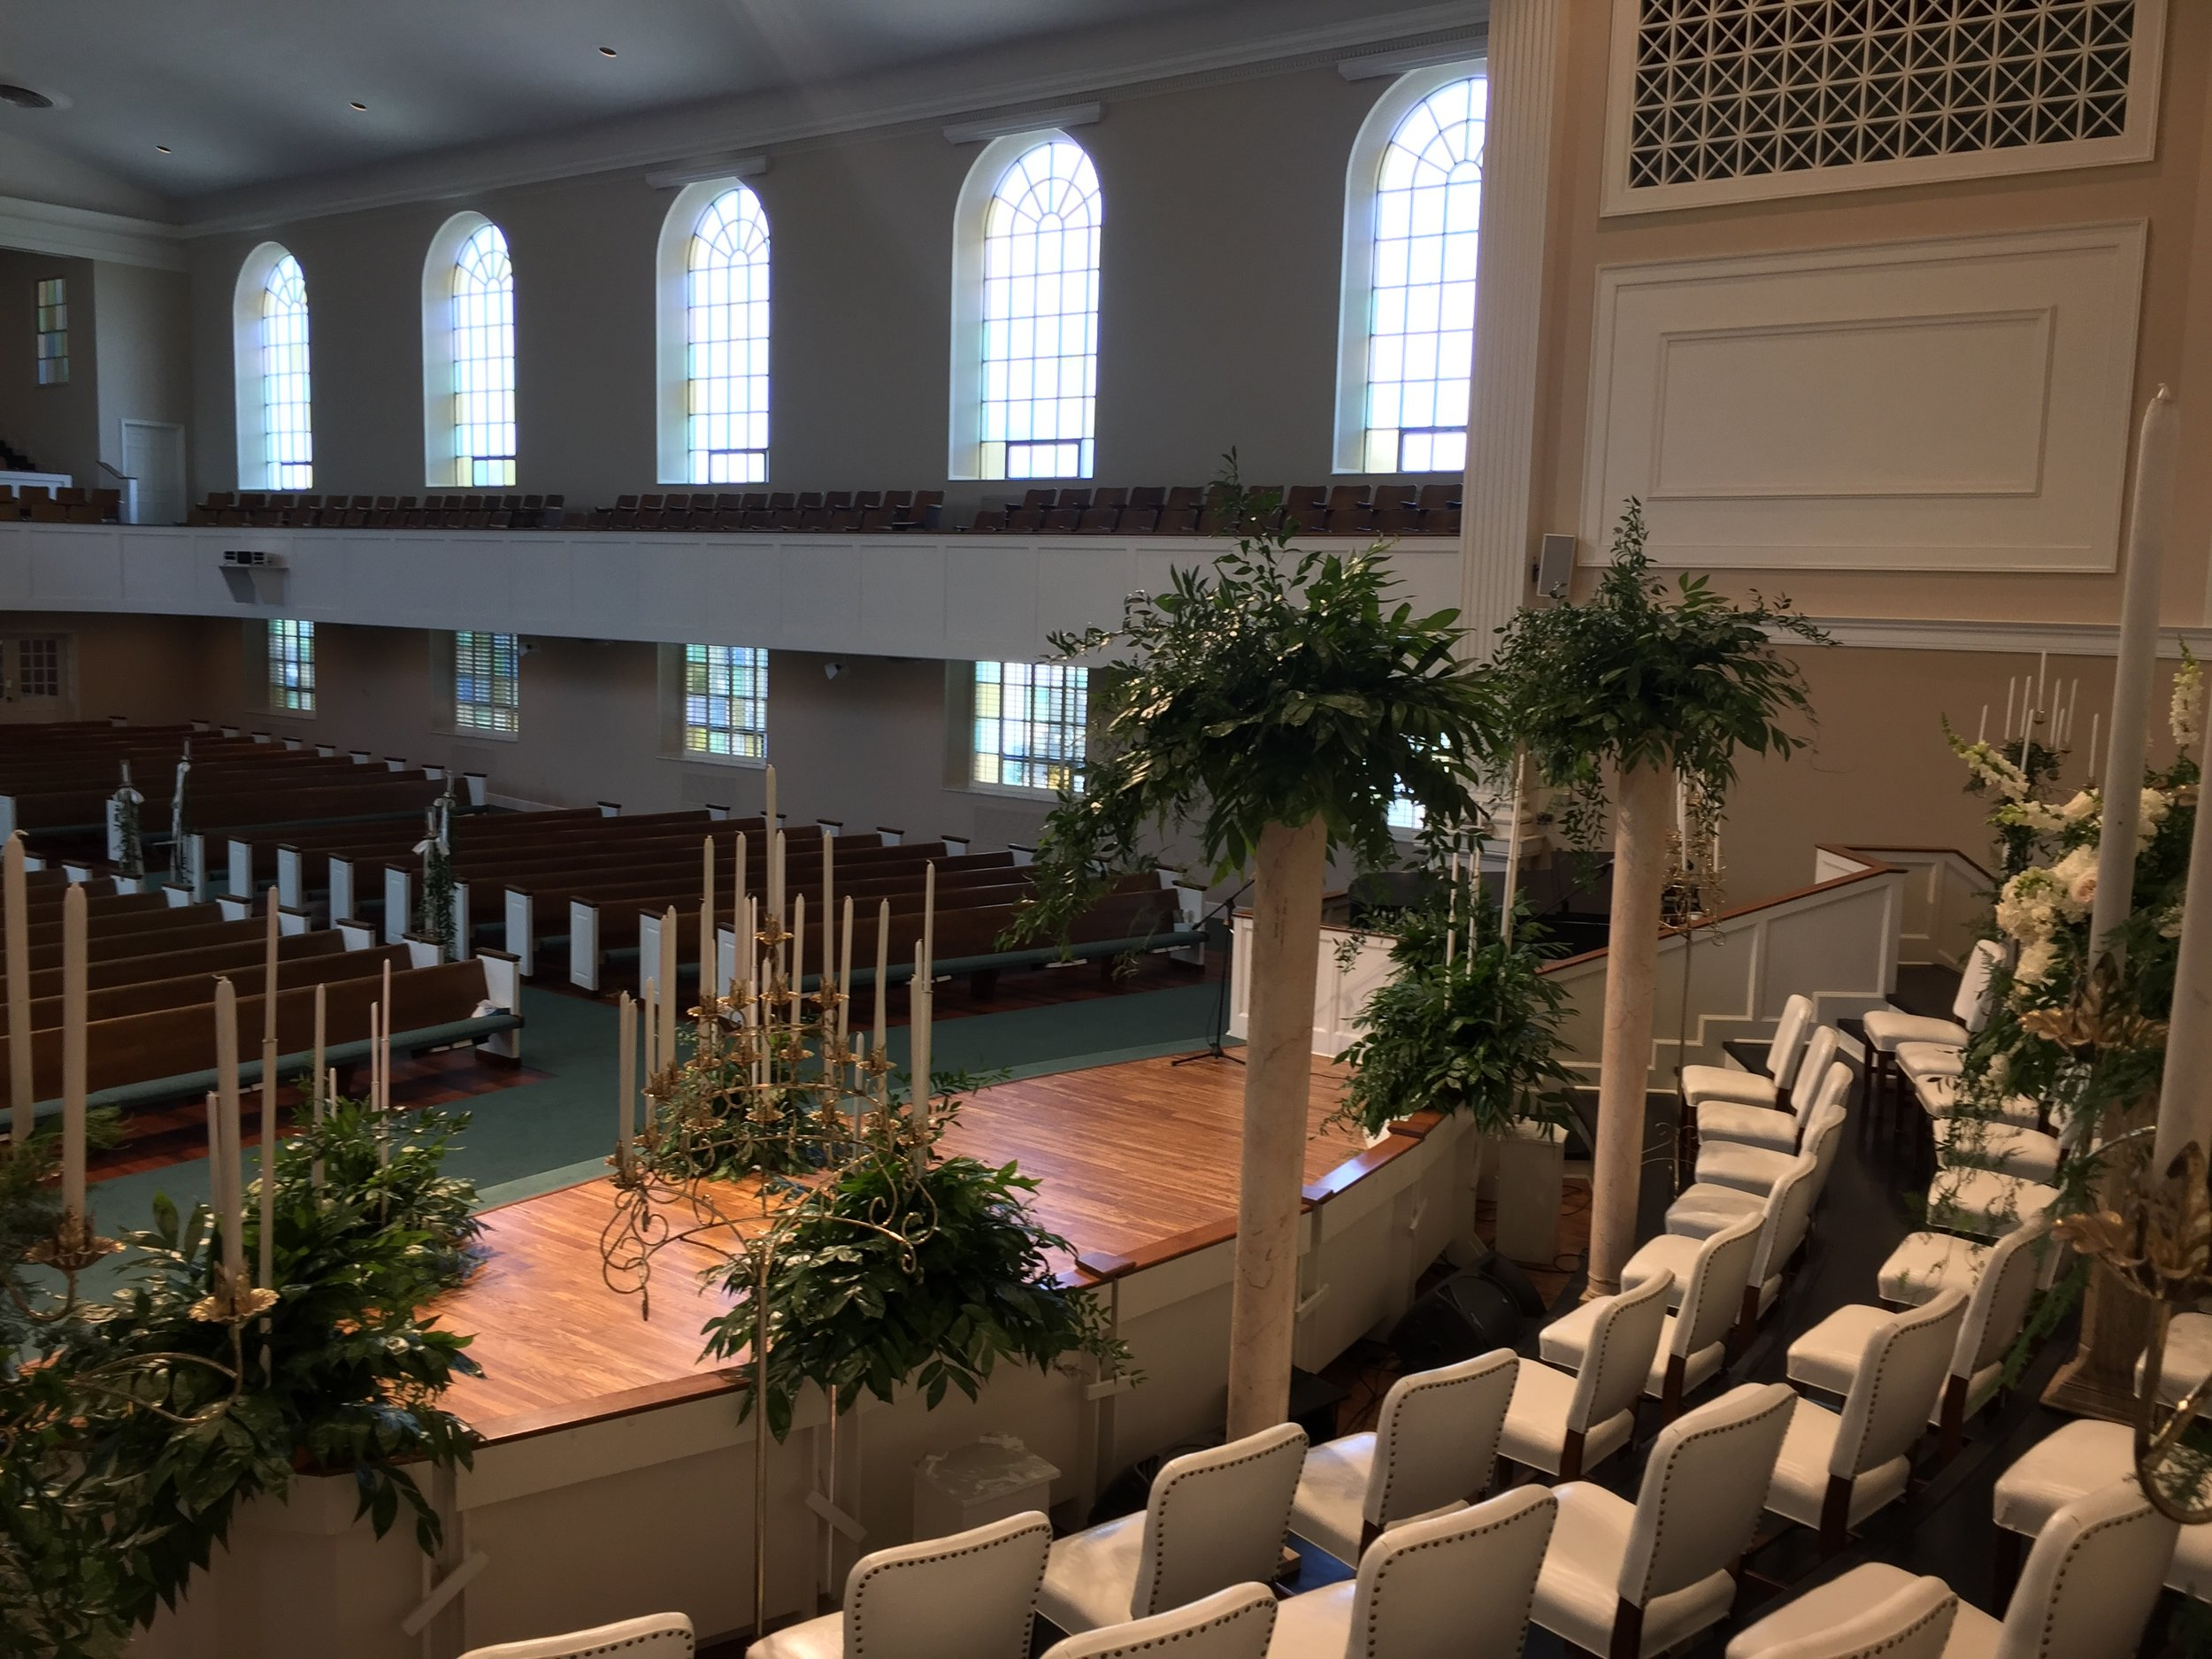 Sanctuary Wedding Decor Choir Loft 062518.JPG